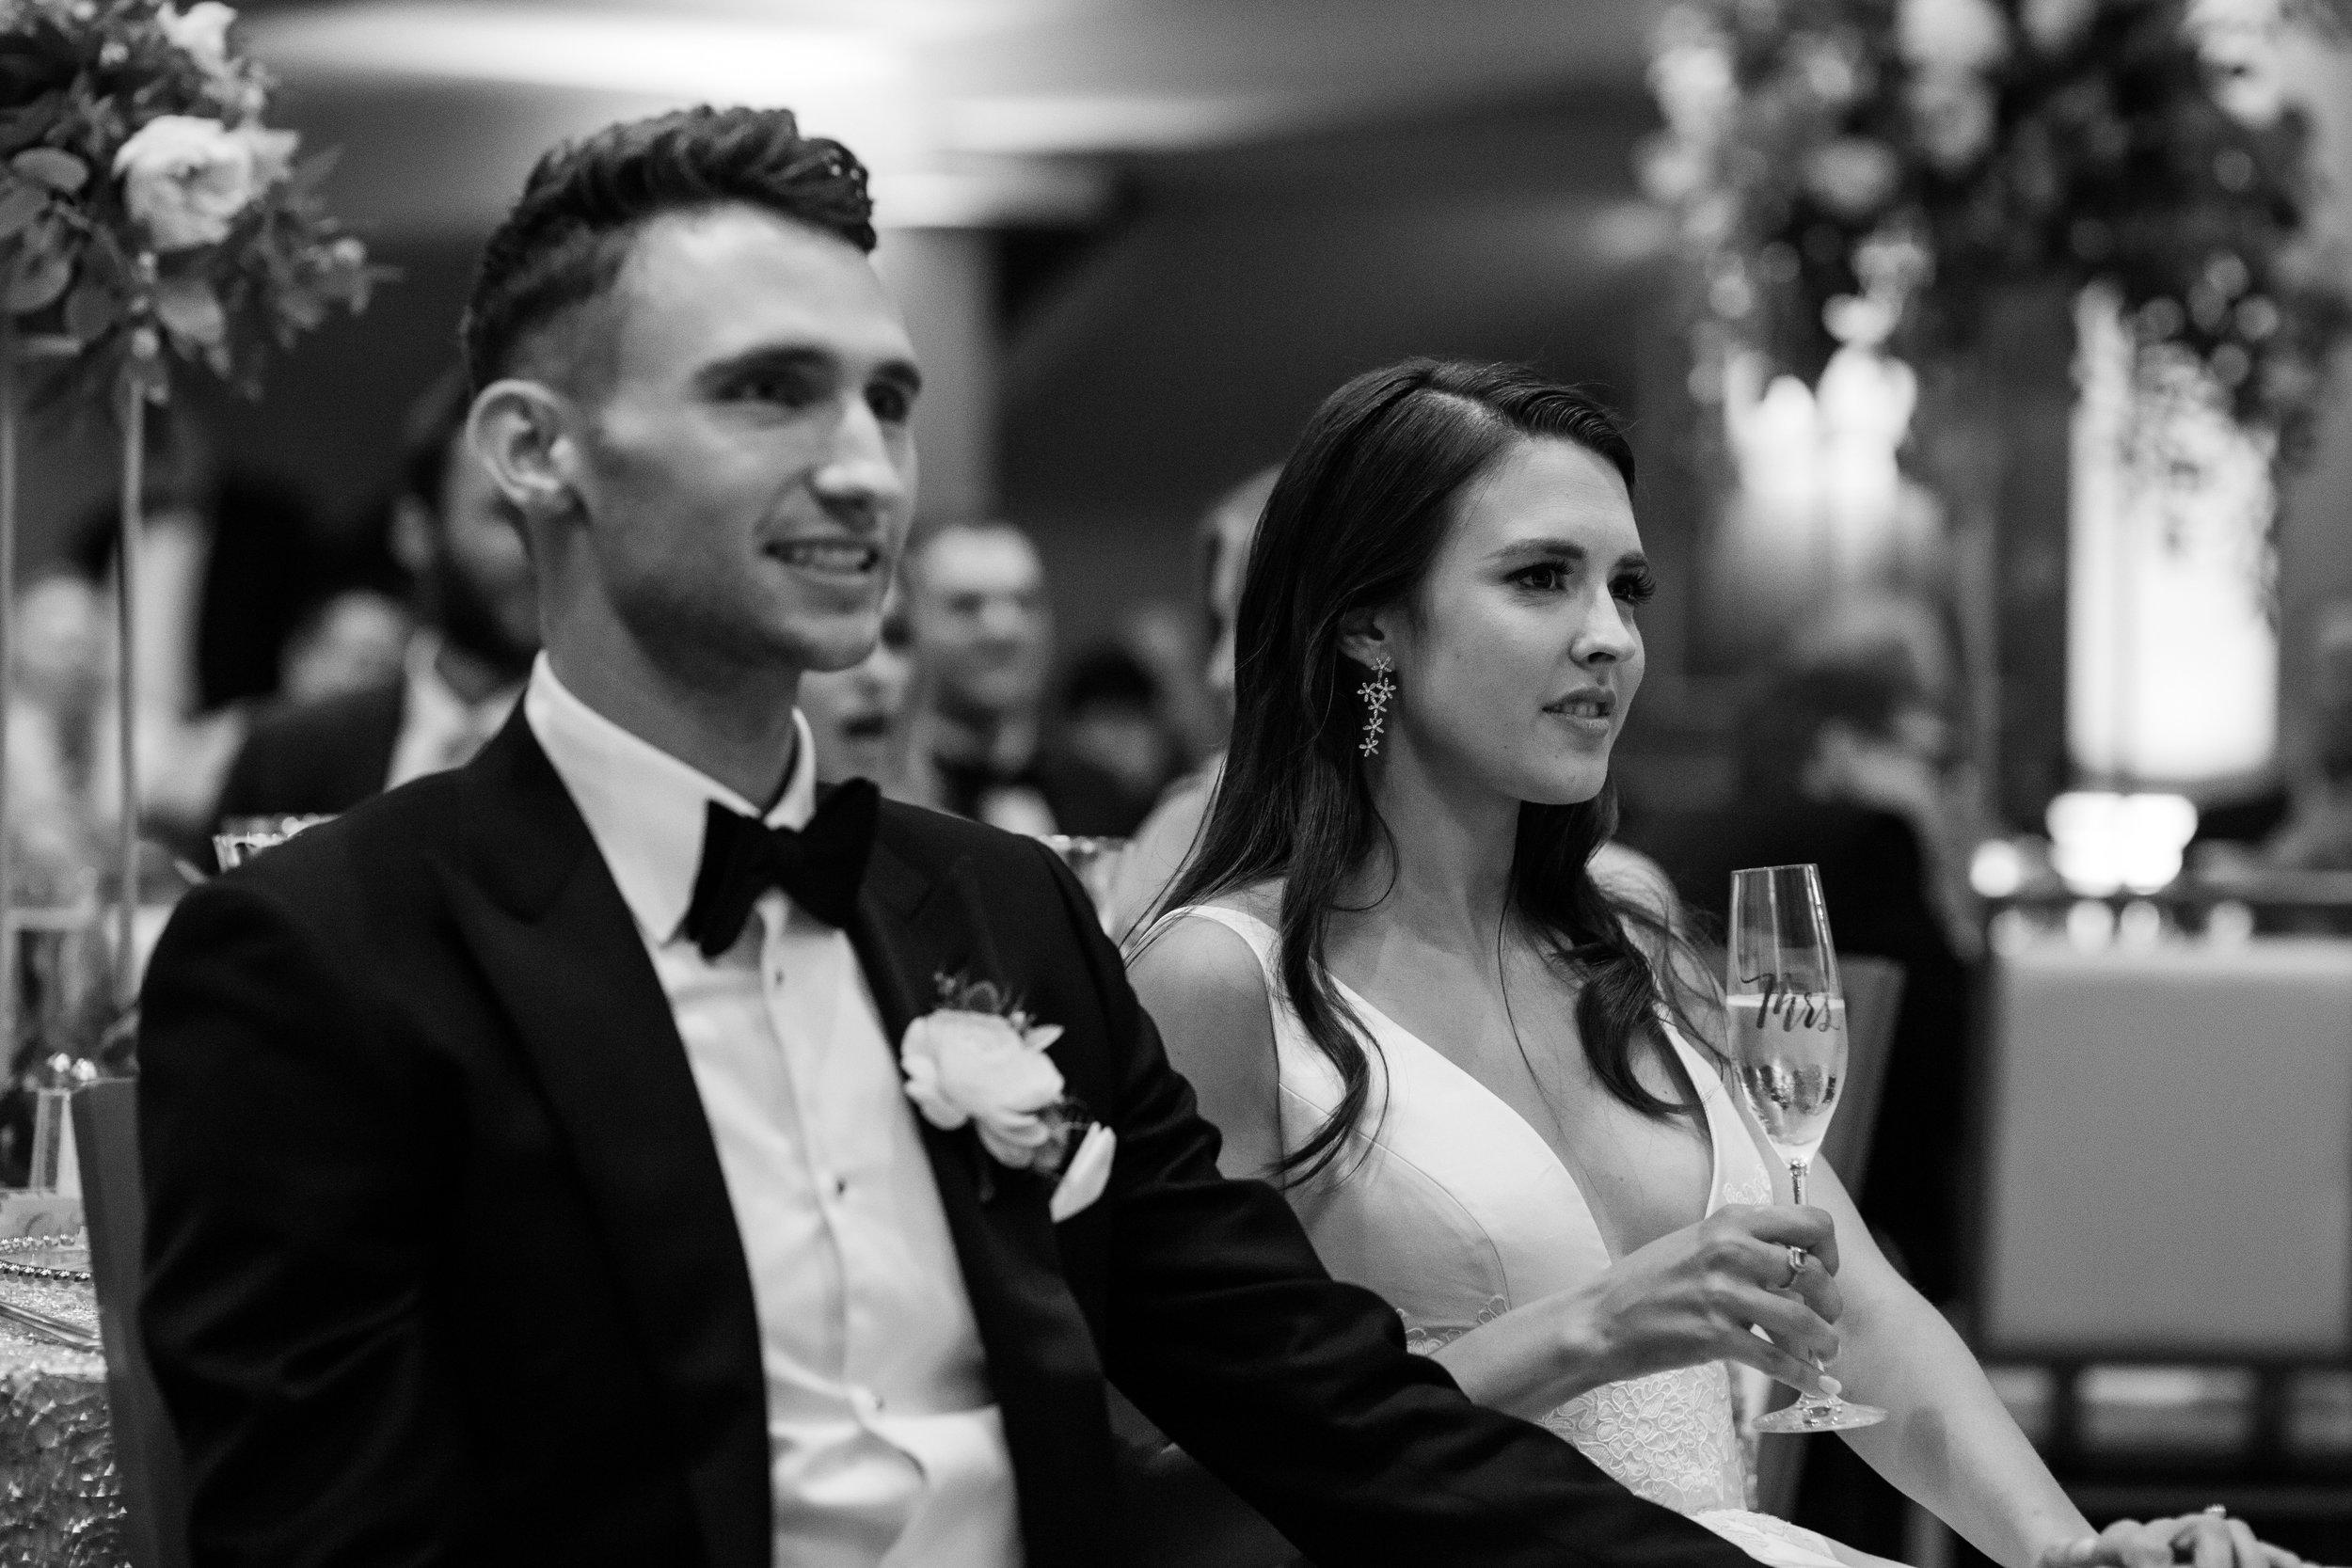 st-anthony-hotel-wedding-photography-10137san-antonio.JPG